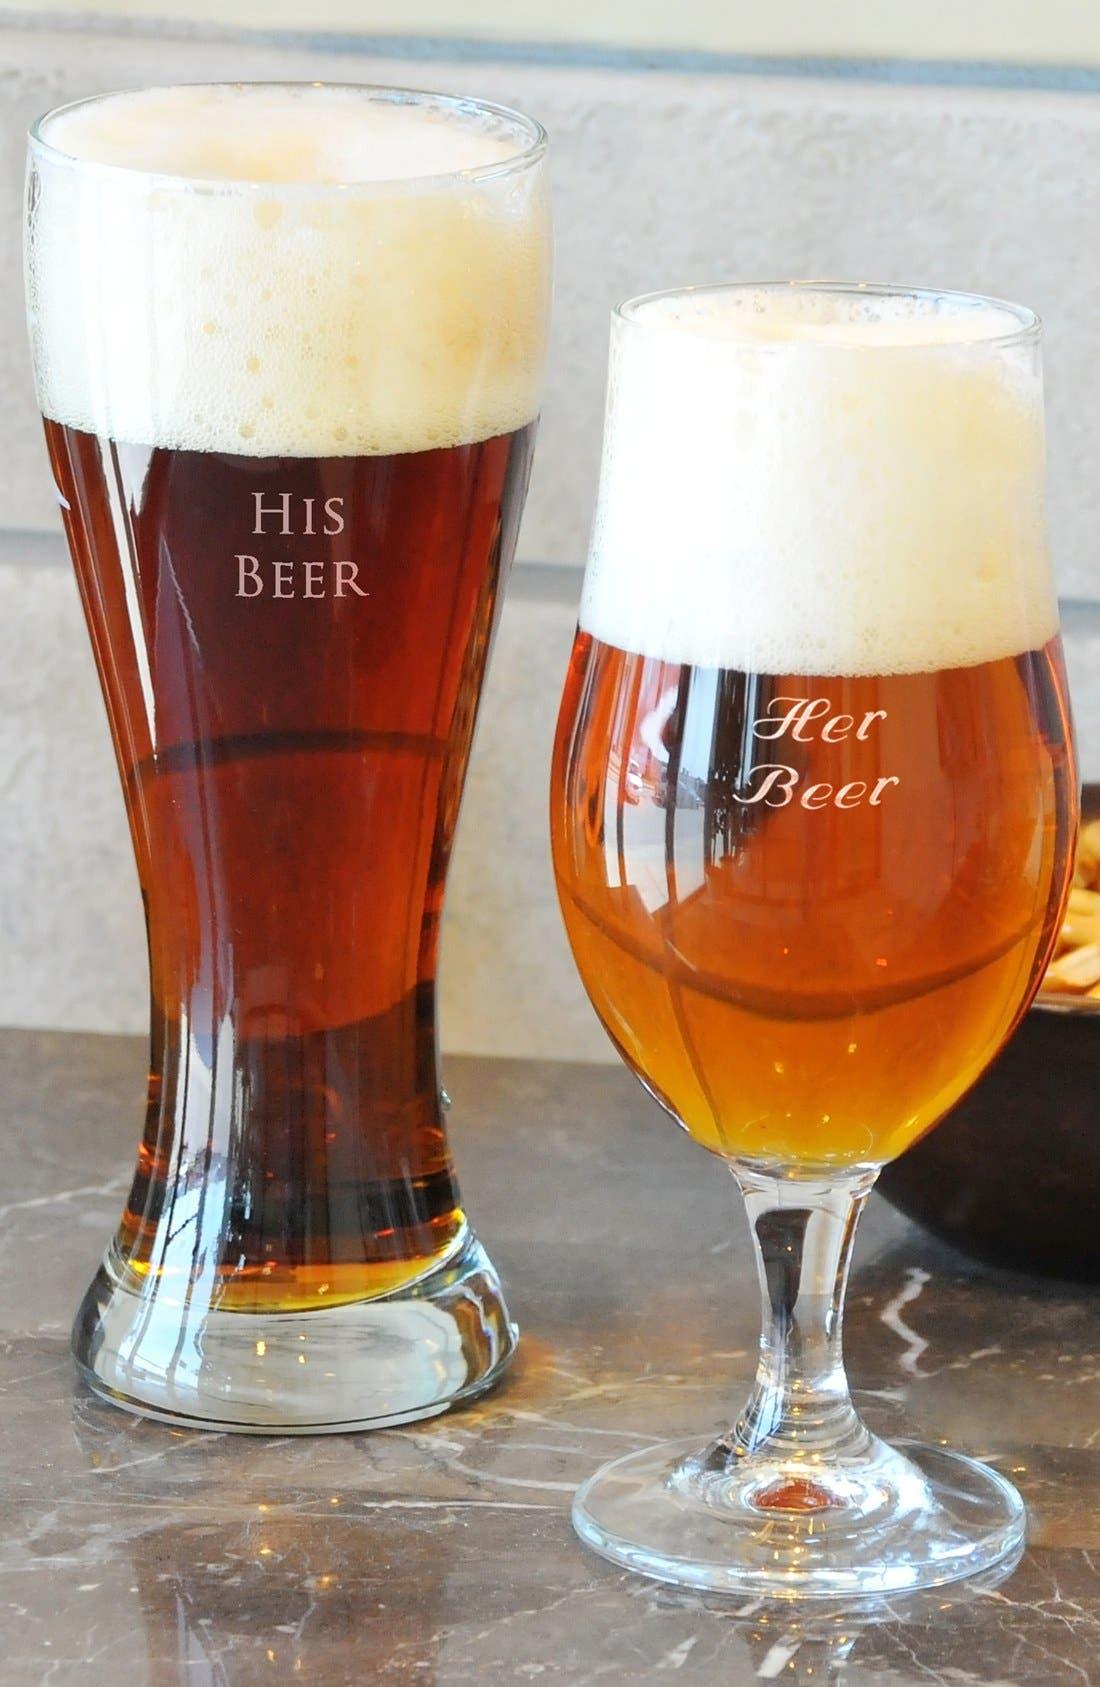 Alternate Image 1 Selected - Cathy's Concepts 'His Beer & Her Beer' Monogram Pilsner Glasses (Set of 2)